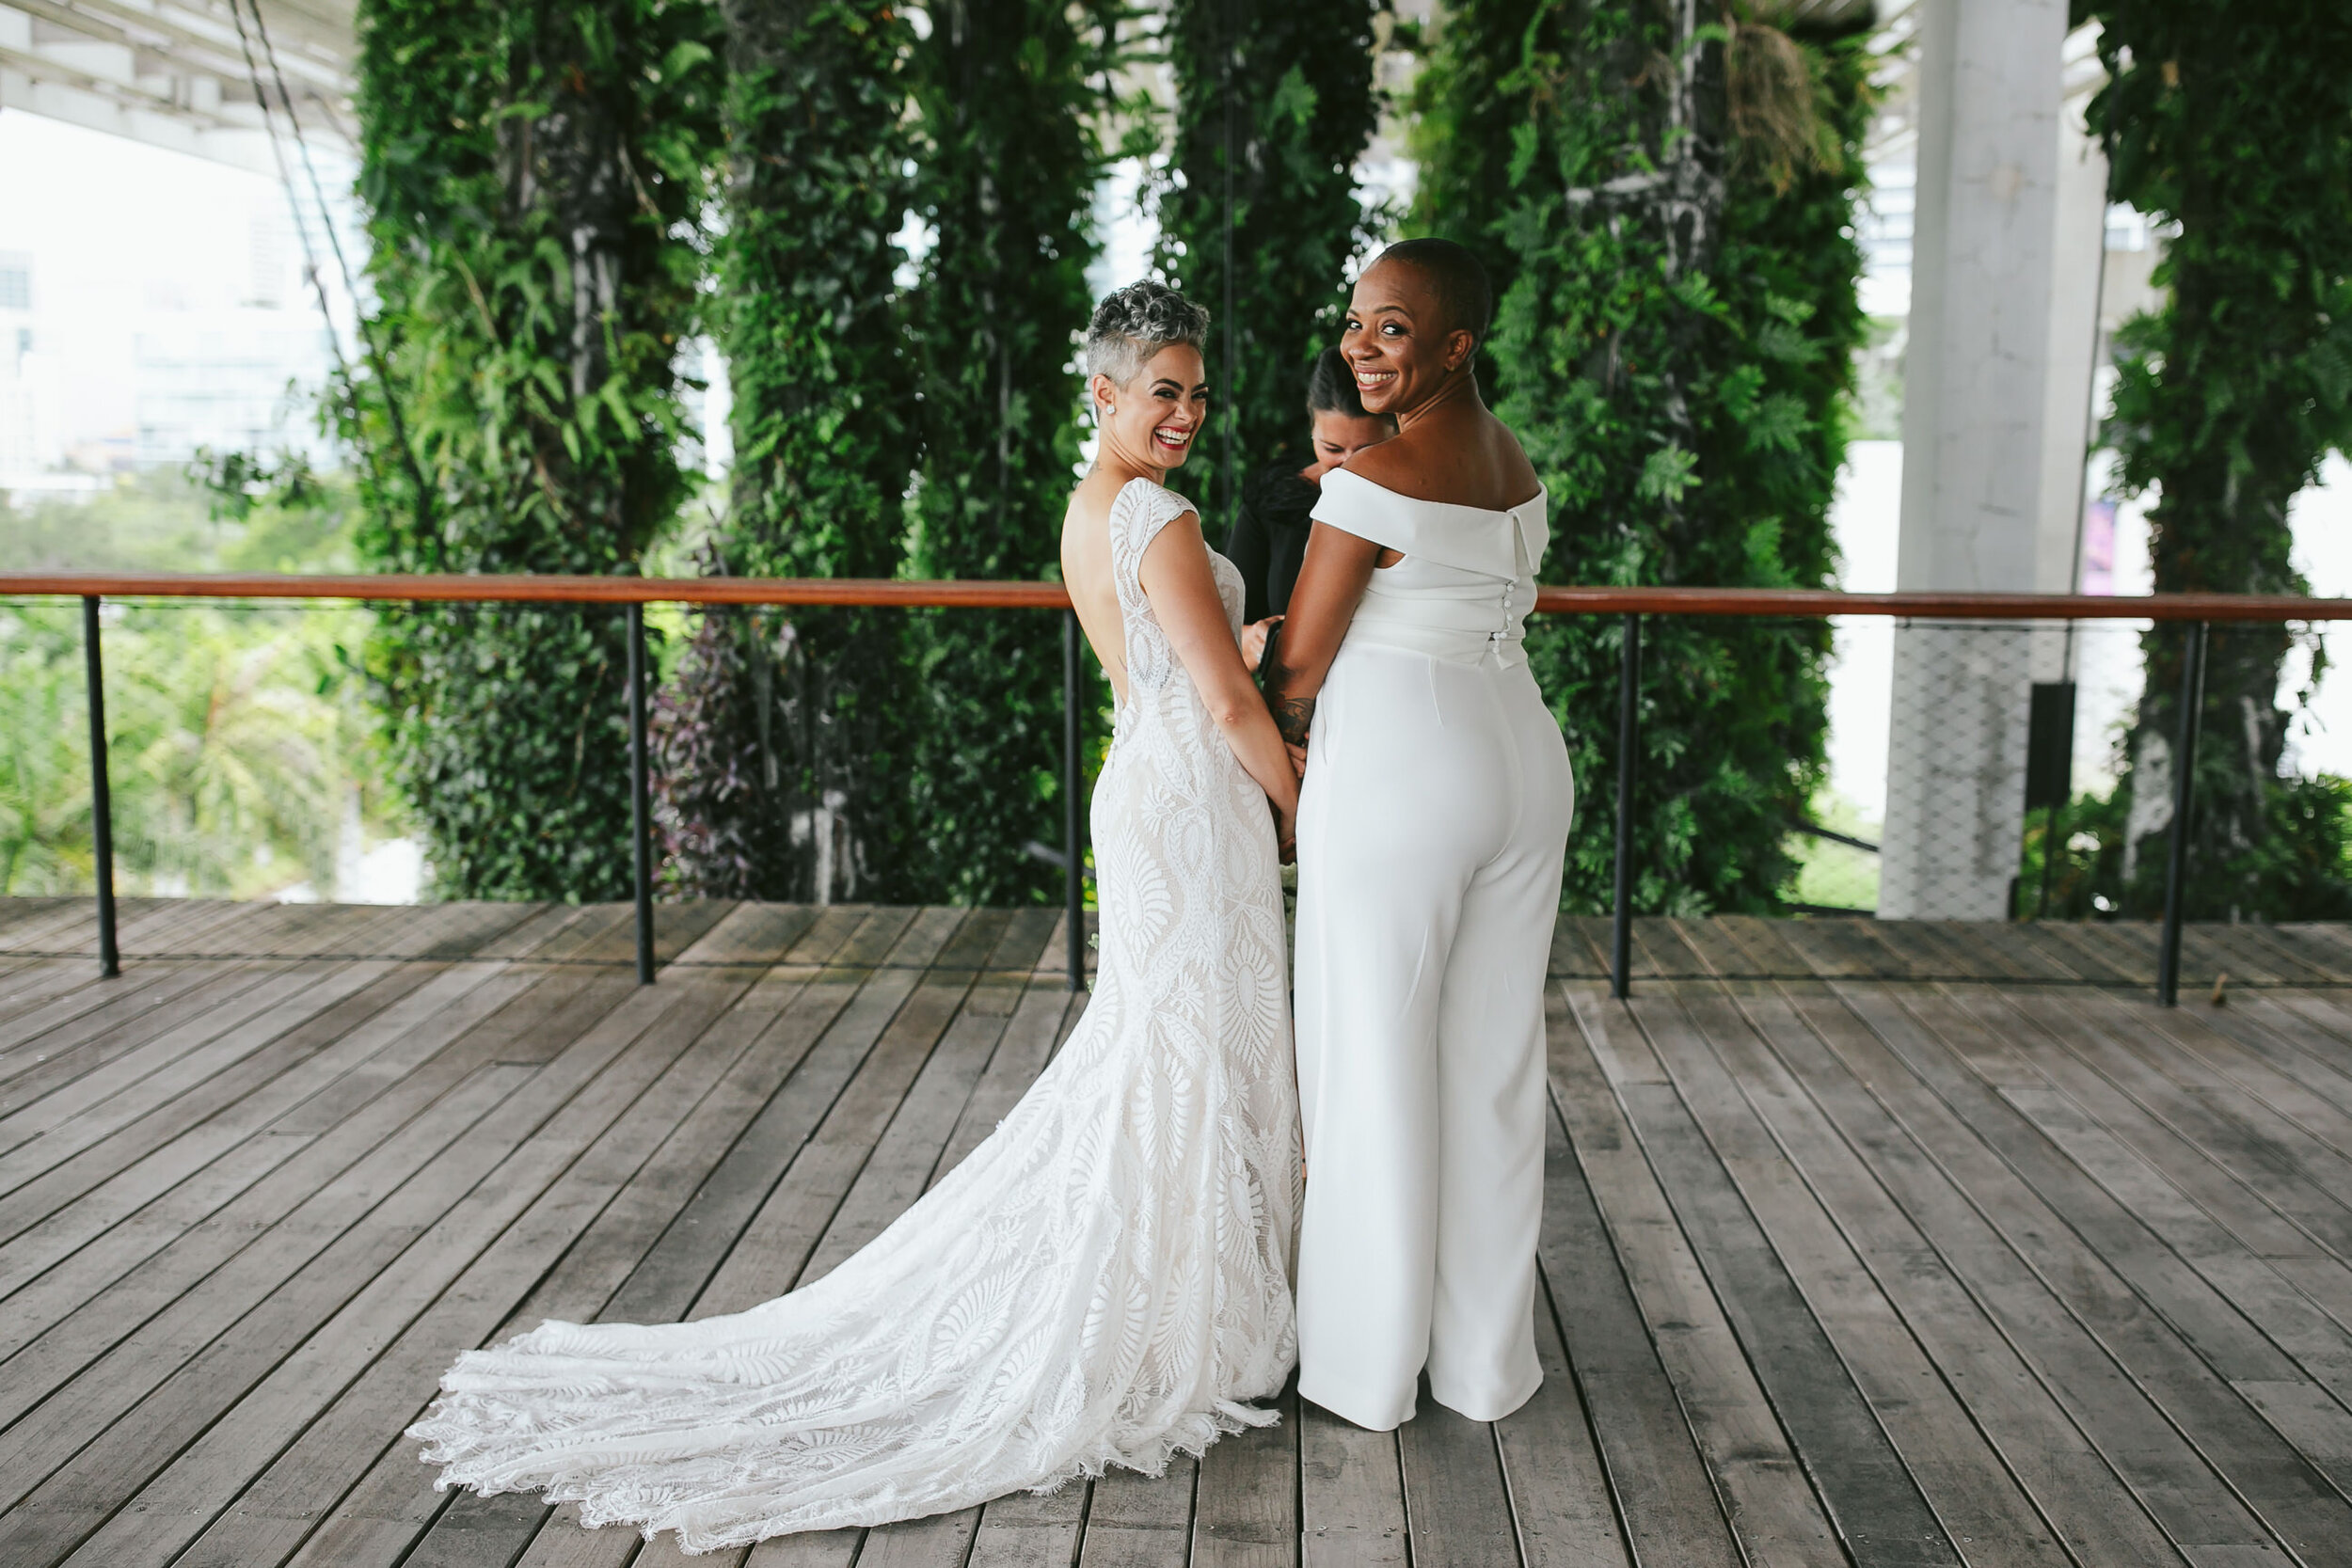 PAMM Elopement Ceremony LGBTQ Wedding